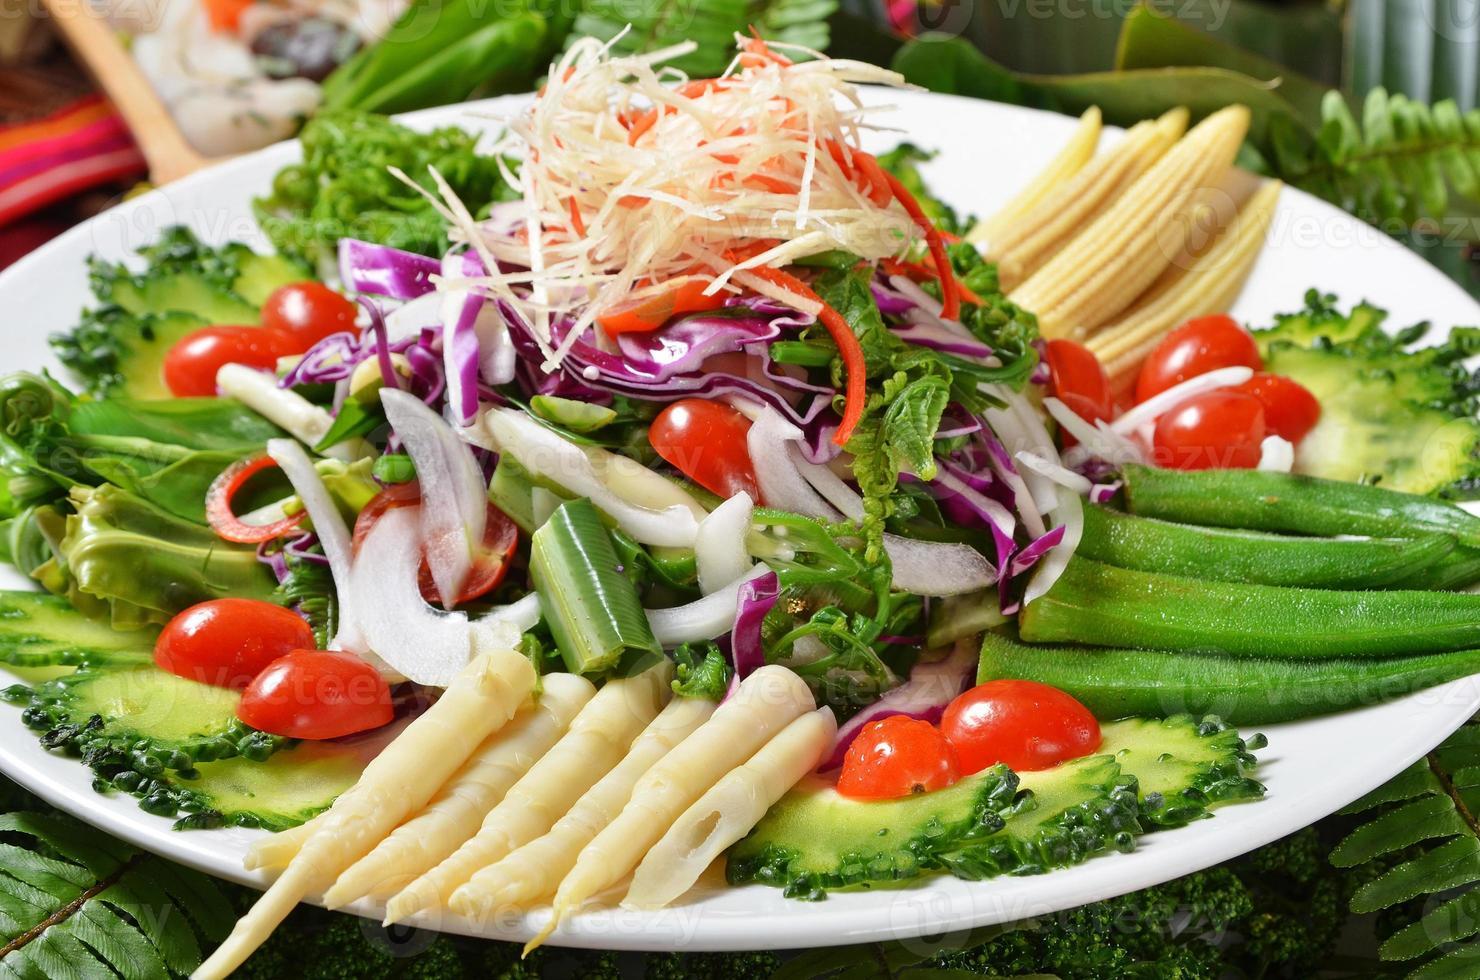 Colorful salad photo